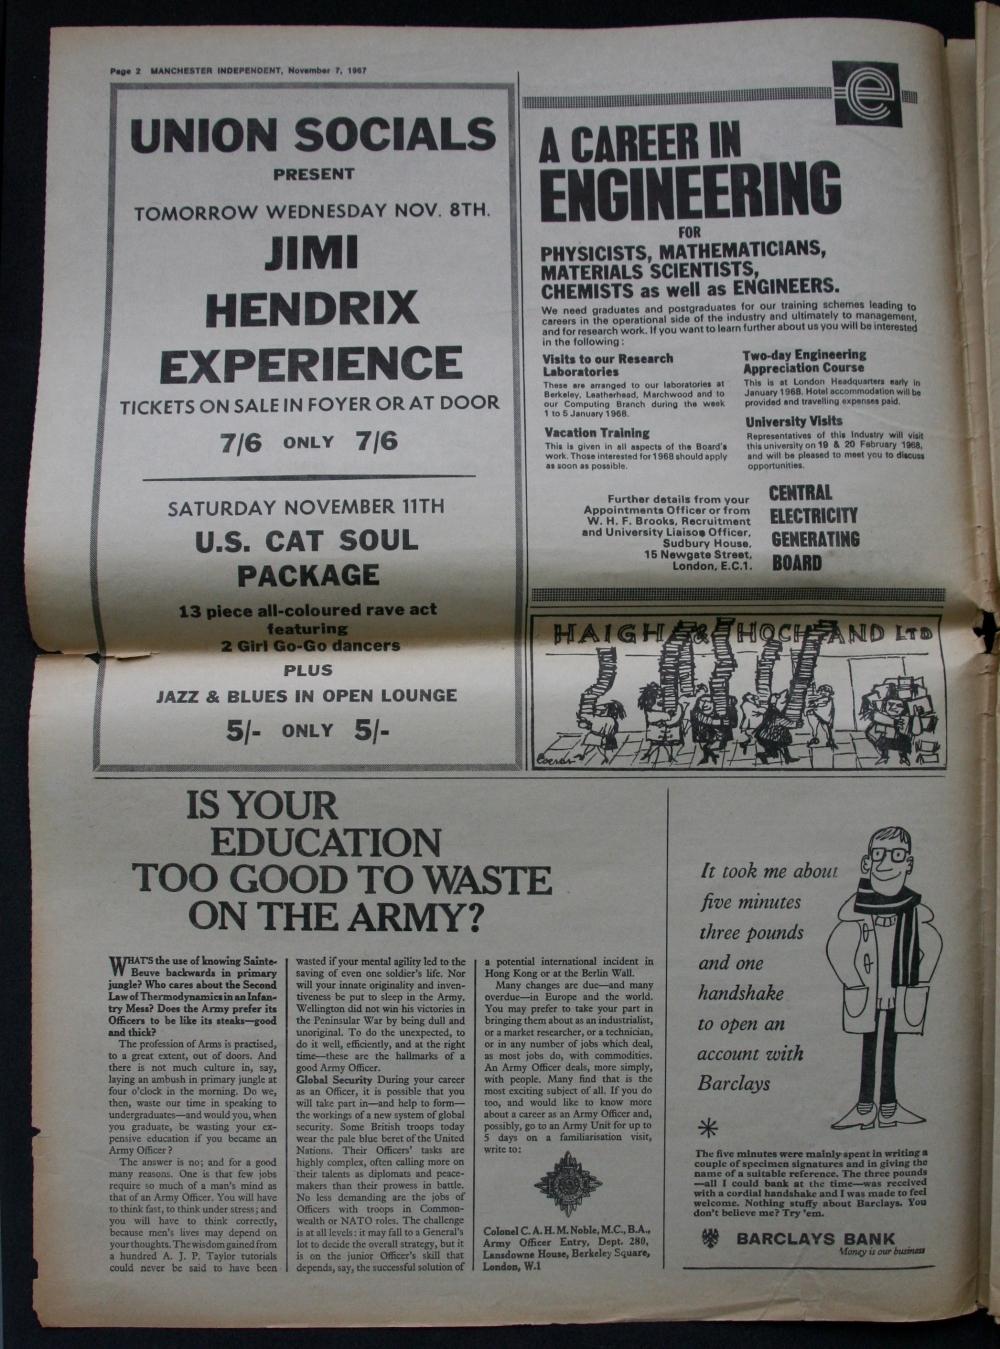 Manchester (The Union) : 8 novembre 1967 HiRes-1